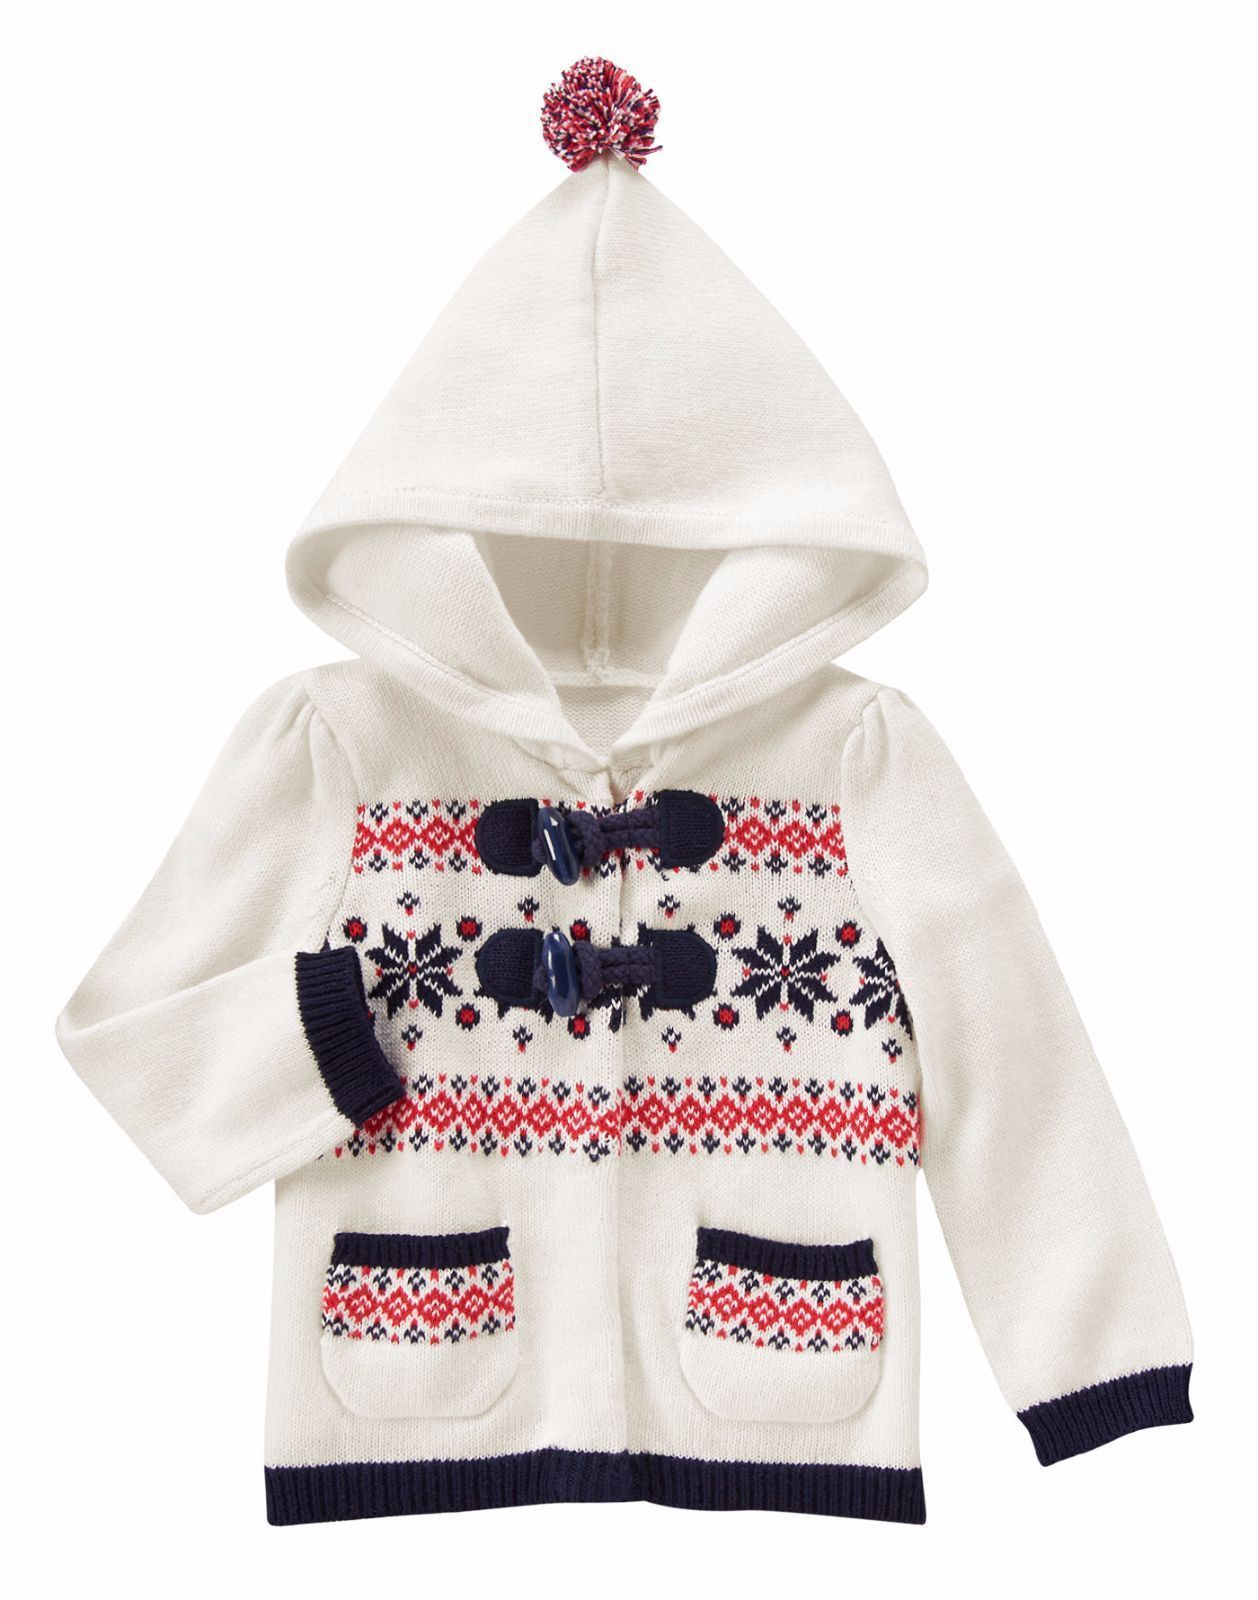 NWT GYMBOREE Baby Girl Kids Girl Fall//Winter LS Tee Top Hoodie